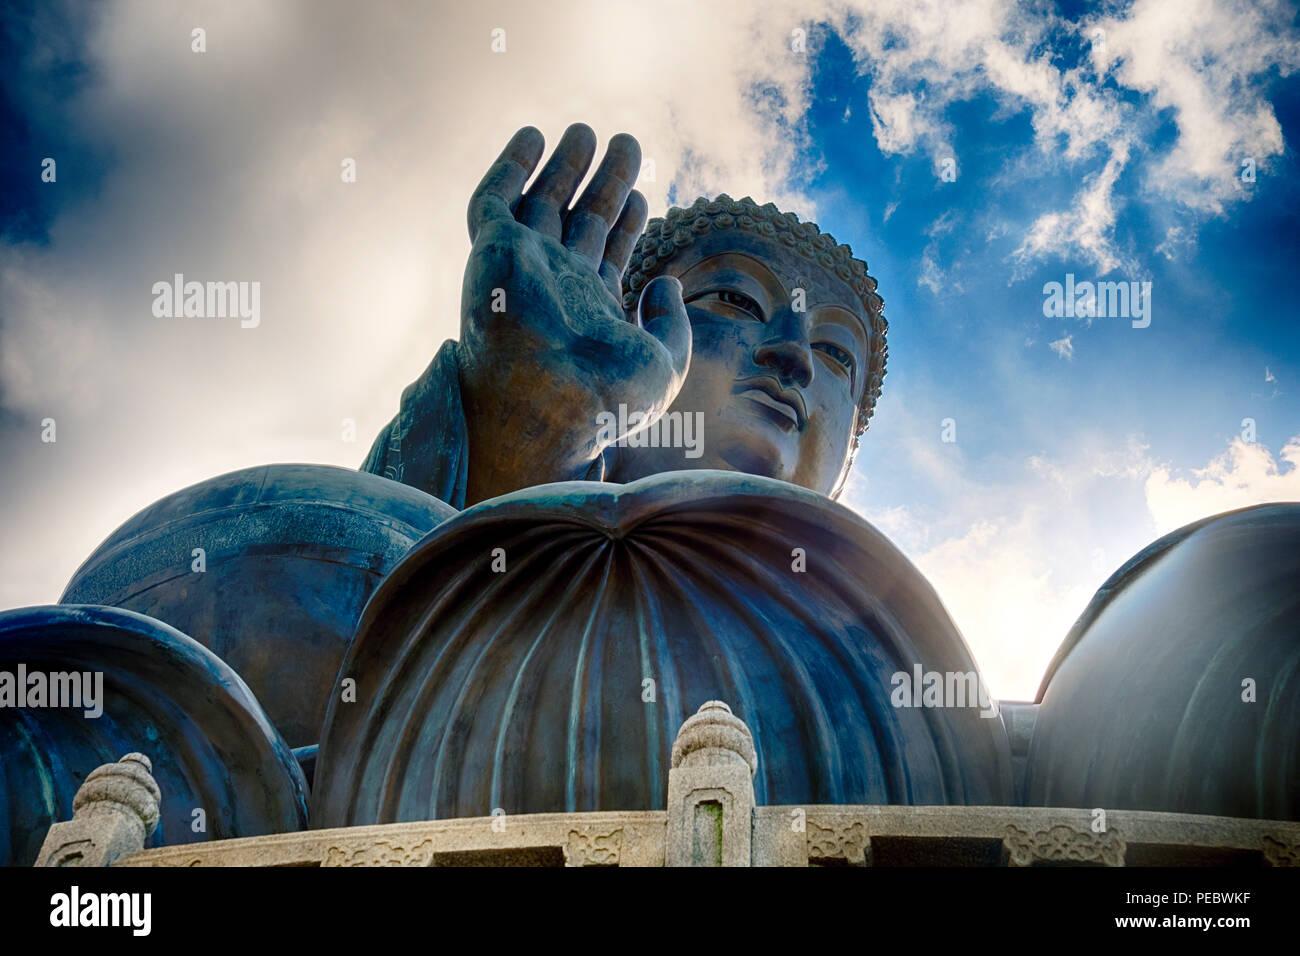 Low Angle View of the Tian Tan Buddha Statue, Enthroned on a Lotus Flower, Ngong Ping, Lantau Island, Hong Kong, China - Stock Image